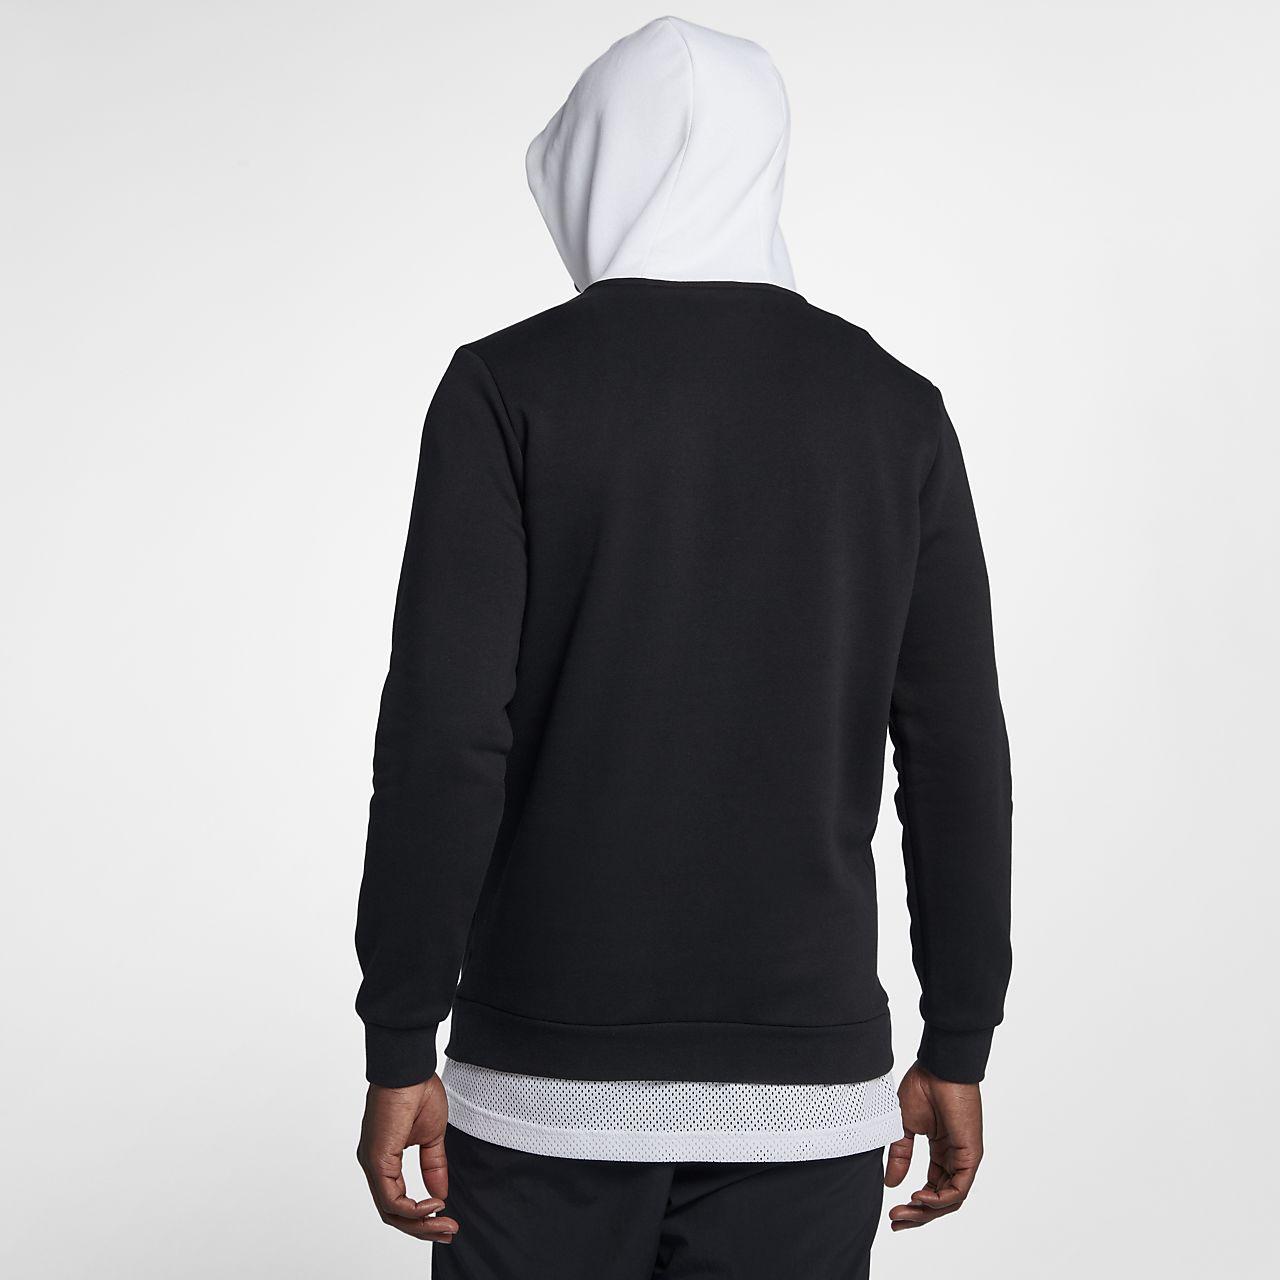 bca1d8689eb4ed Jordan Jumpman Air Men s Fleece Pullover Hoodie. Nike.com